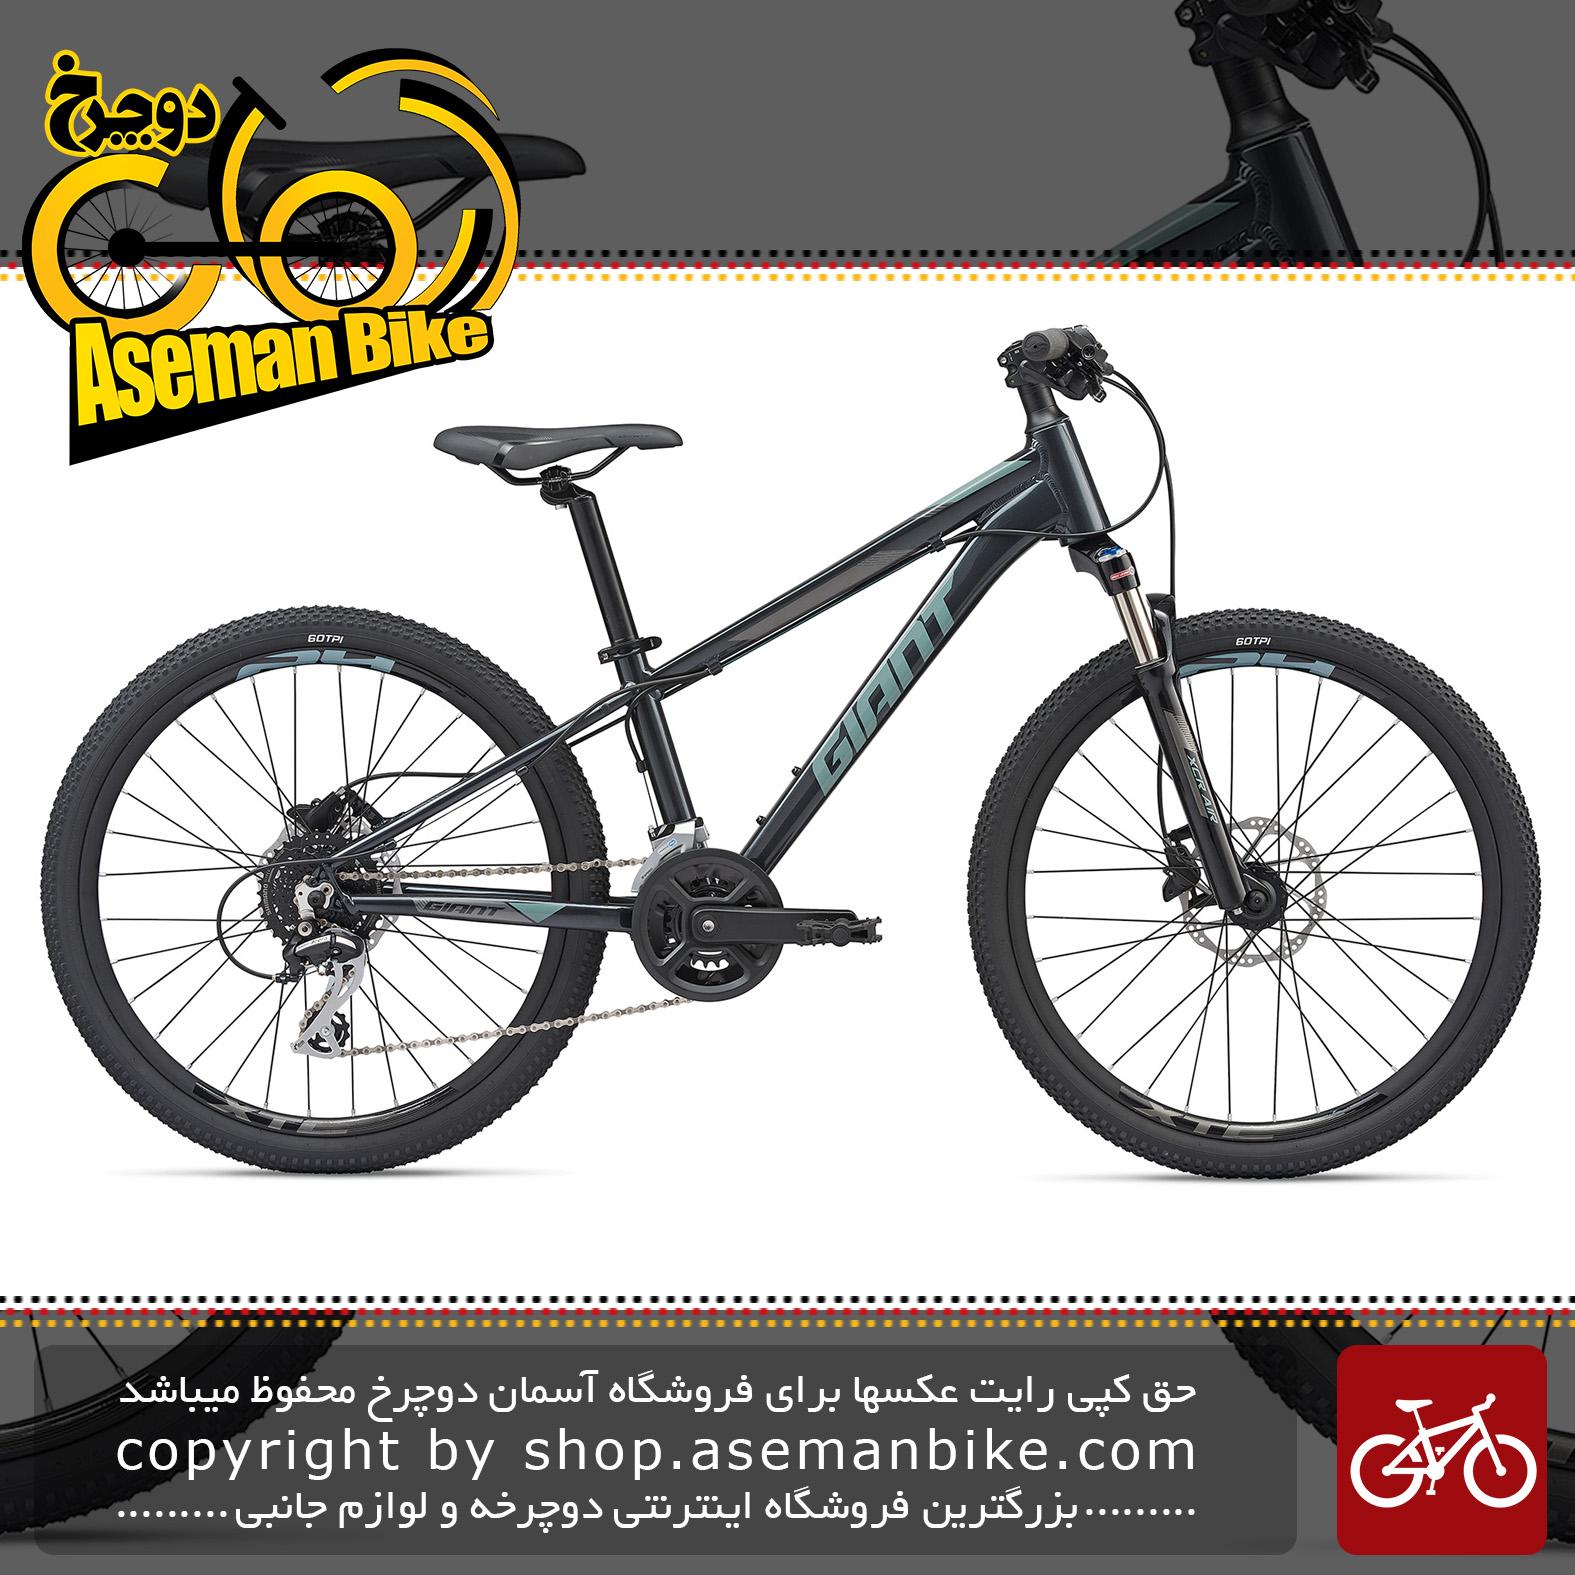 دوچرخه کوهستان جاینت مدل ایکس تی سی اس ال جی آر 24 اینچ 2020 Giant Mountain Bicycle XtC SL Jr 24 2020